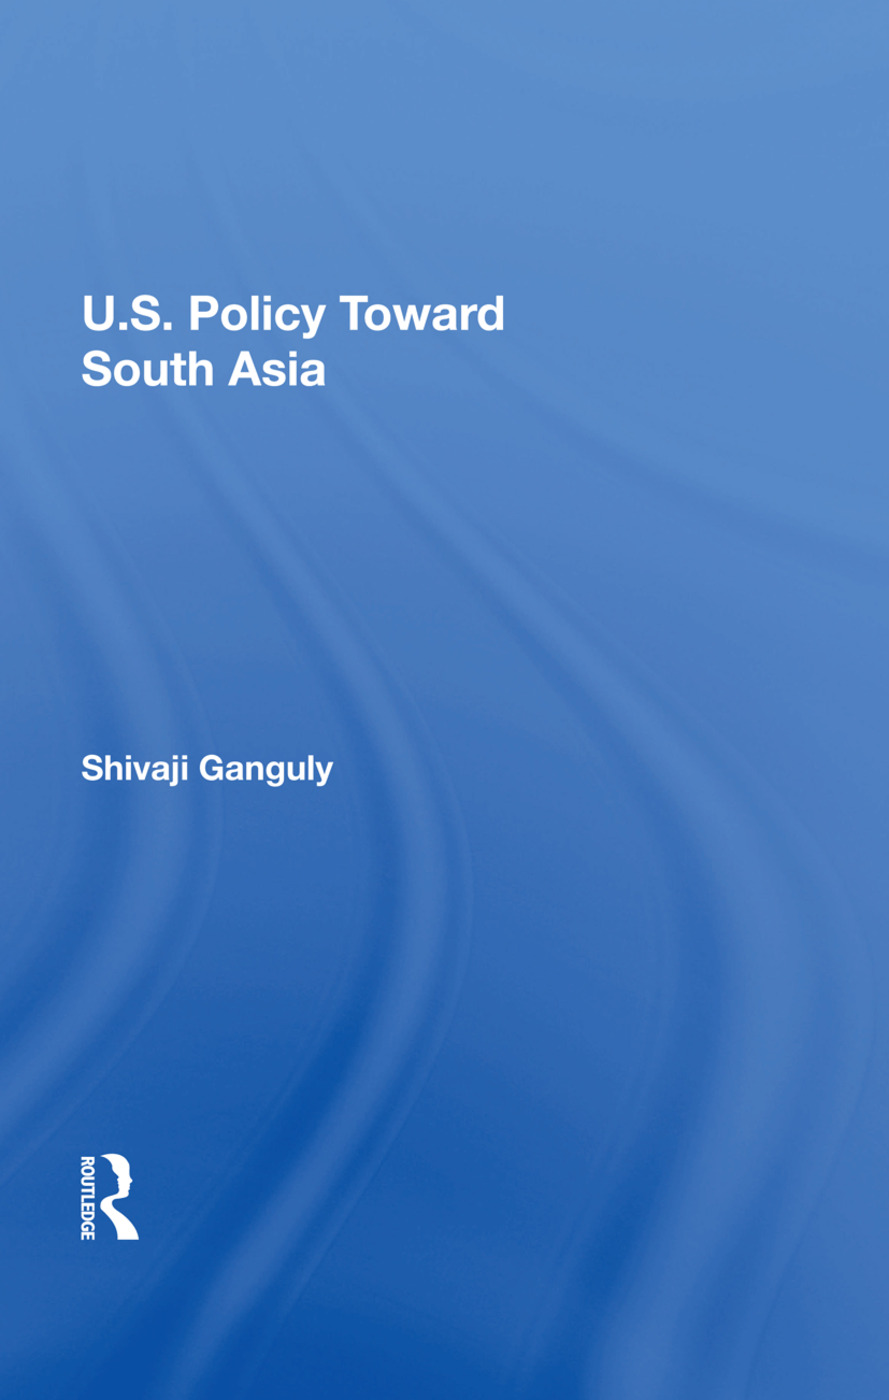 India's China War: The U.S. Response